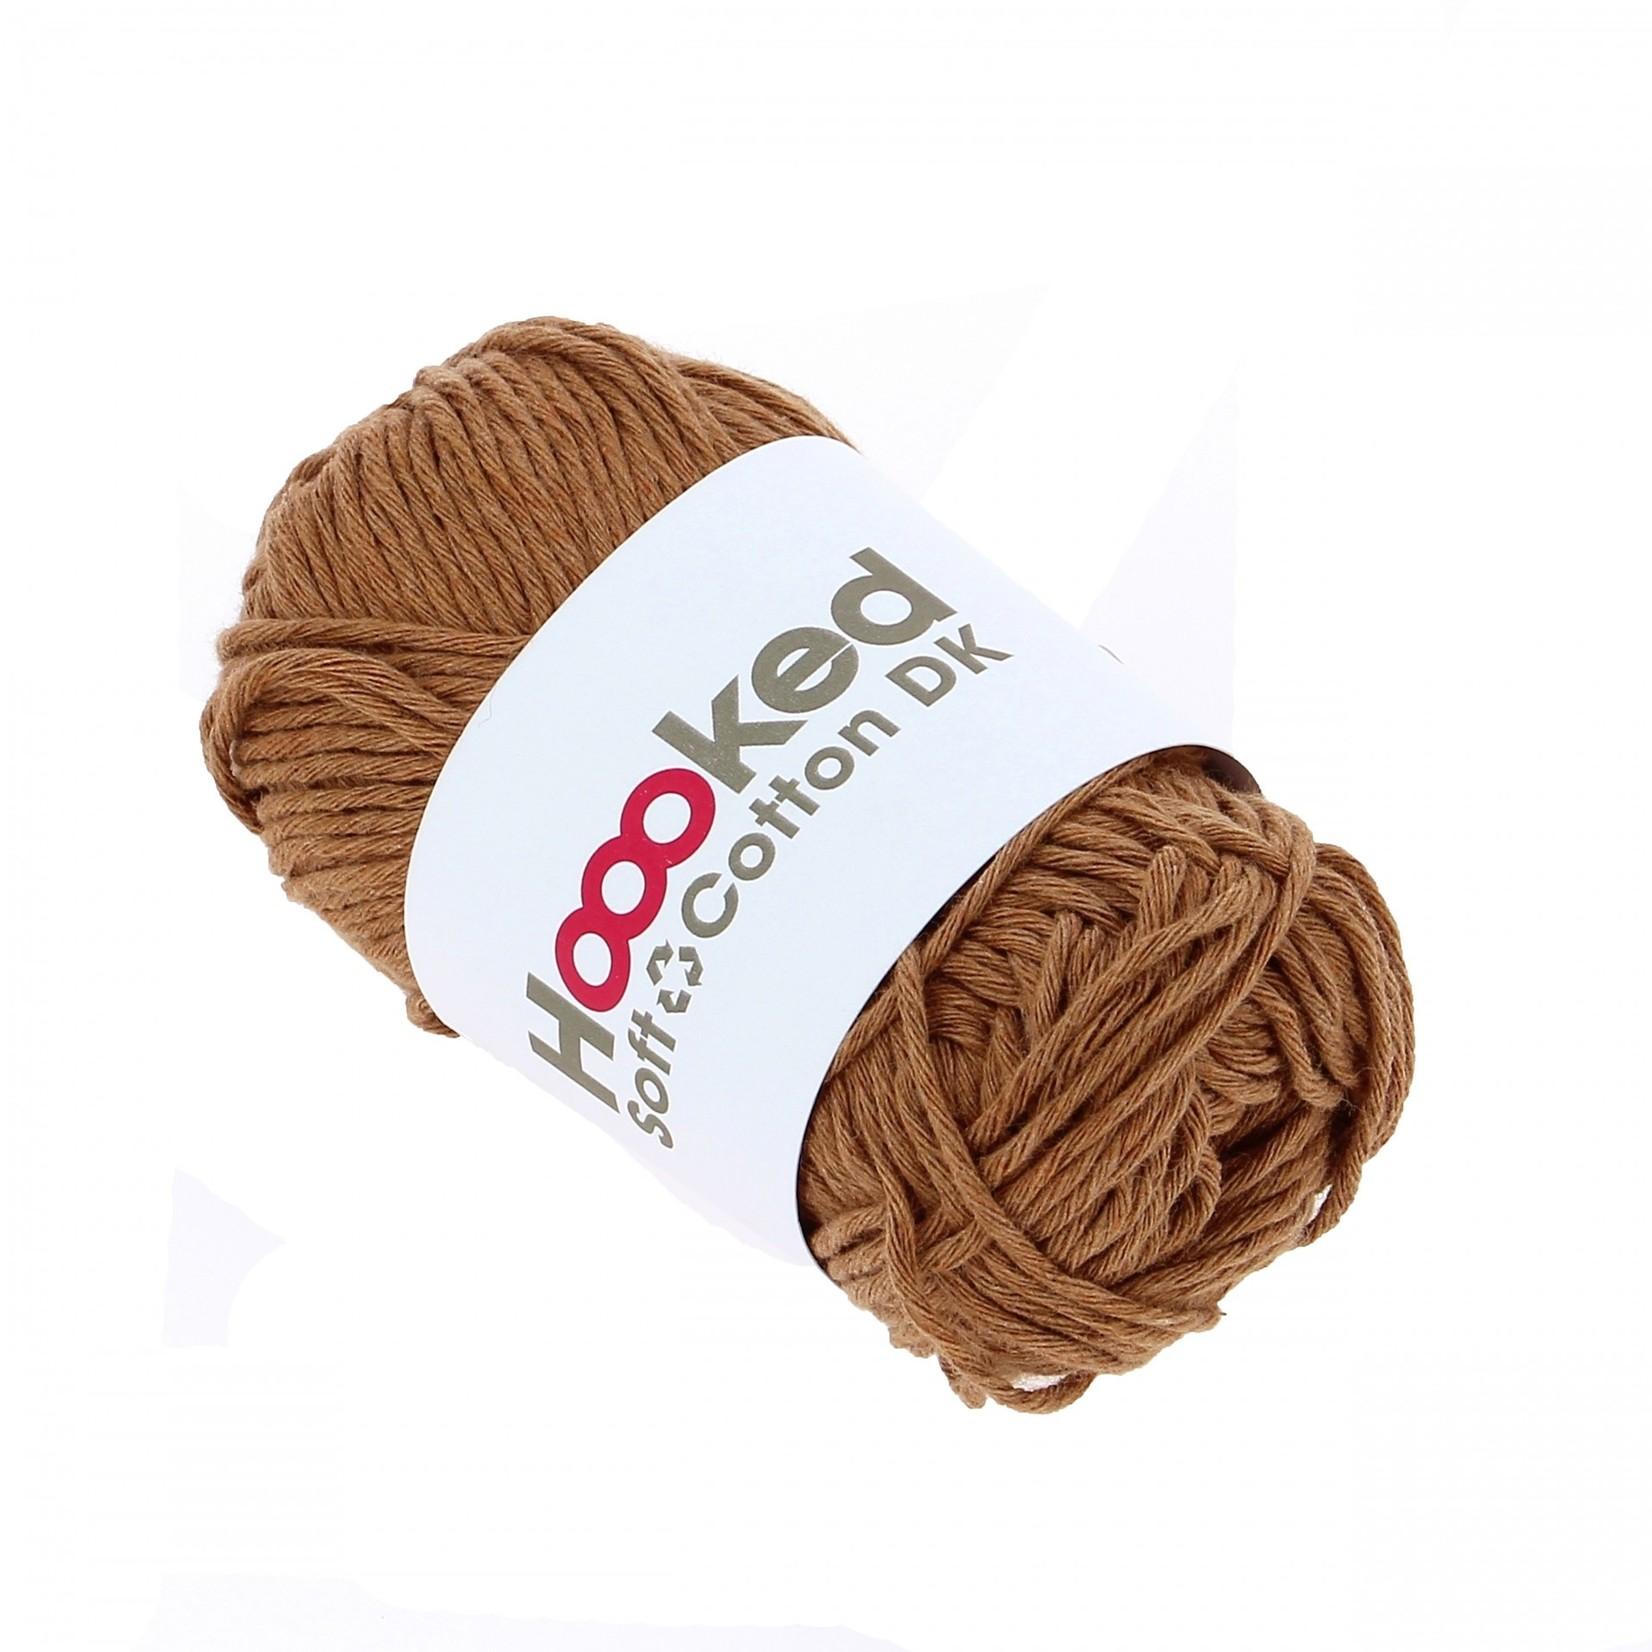 Hoooked Hoooked Soft Cotton DK Caïro Caramel 50 gr. / 85 m.